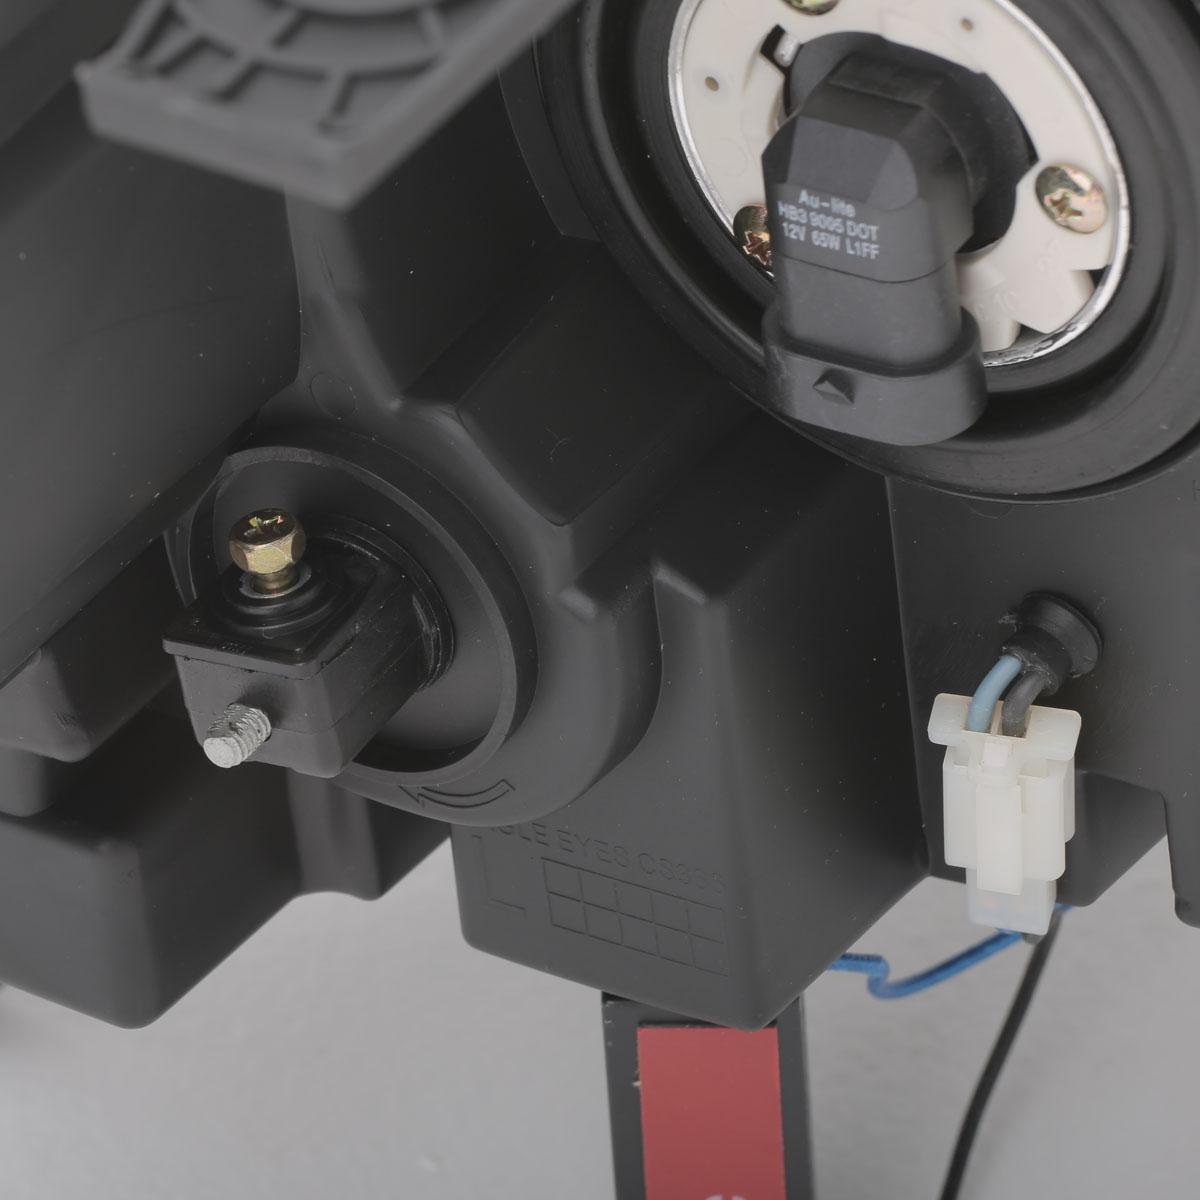 2013 Jeep Grand Cherokee Headlight Diagram Electrical Wiring Diagrams Ultron Neon Tube 2014 2015 Black Projector Head Lights